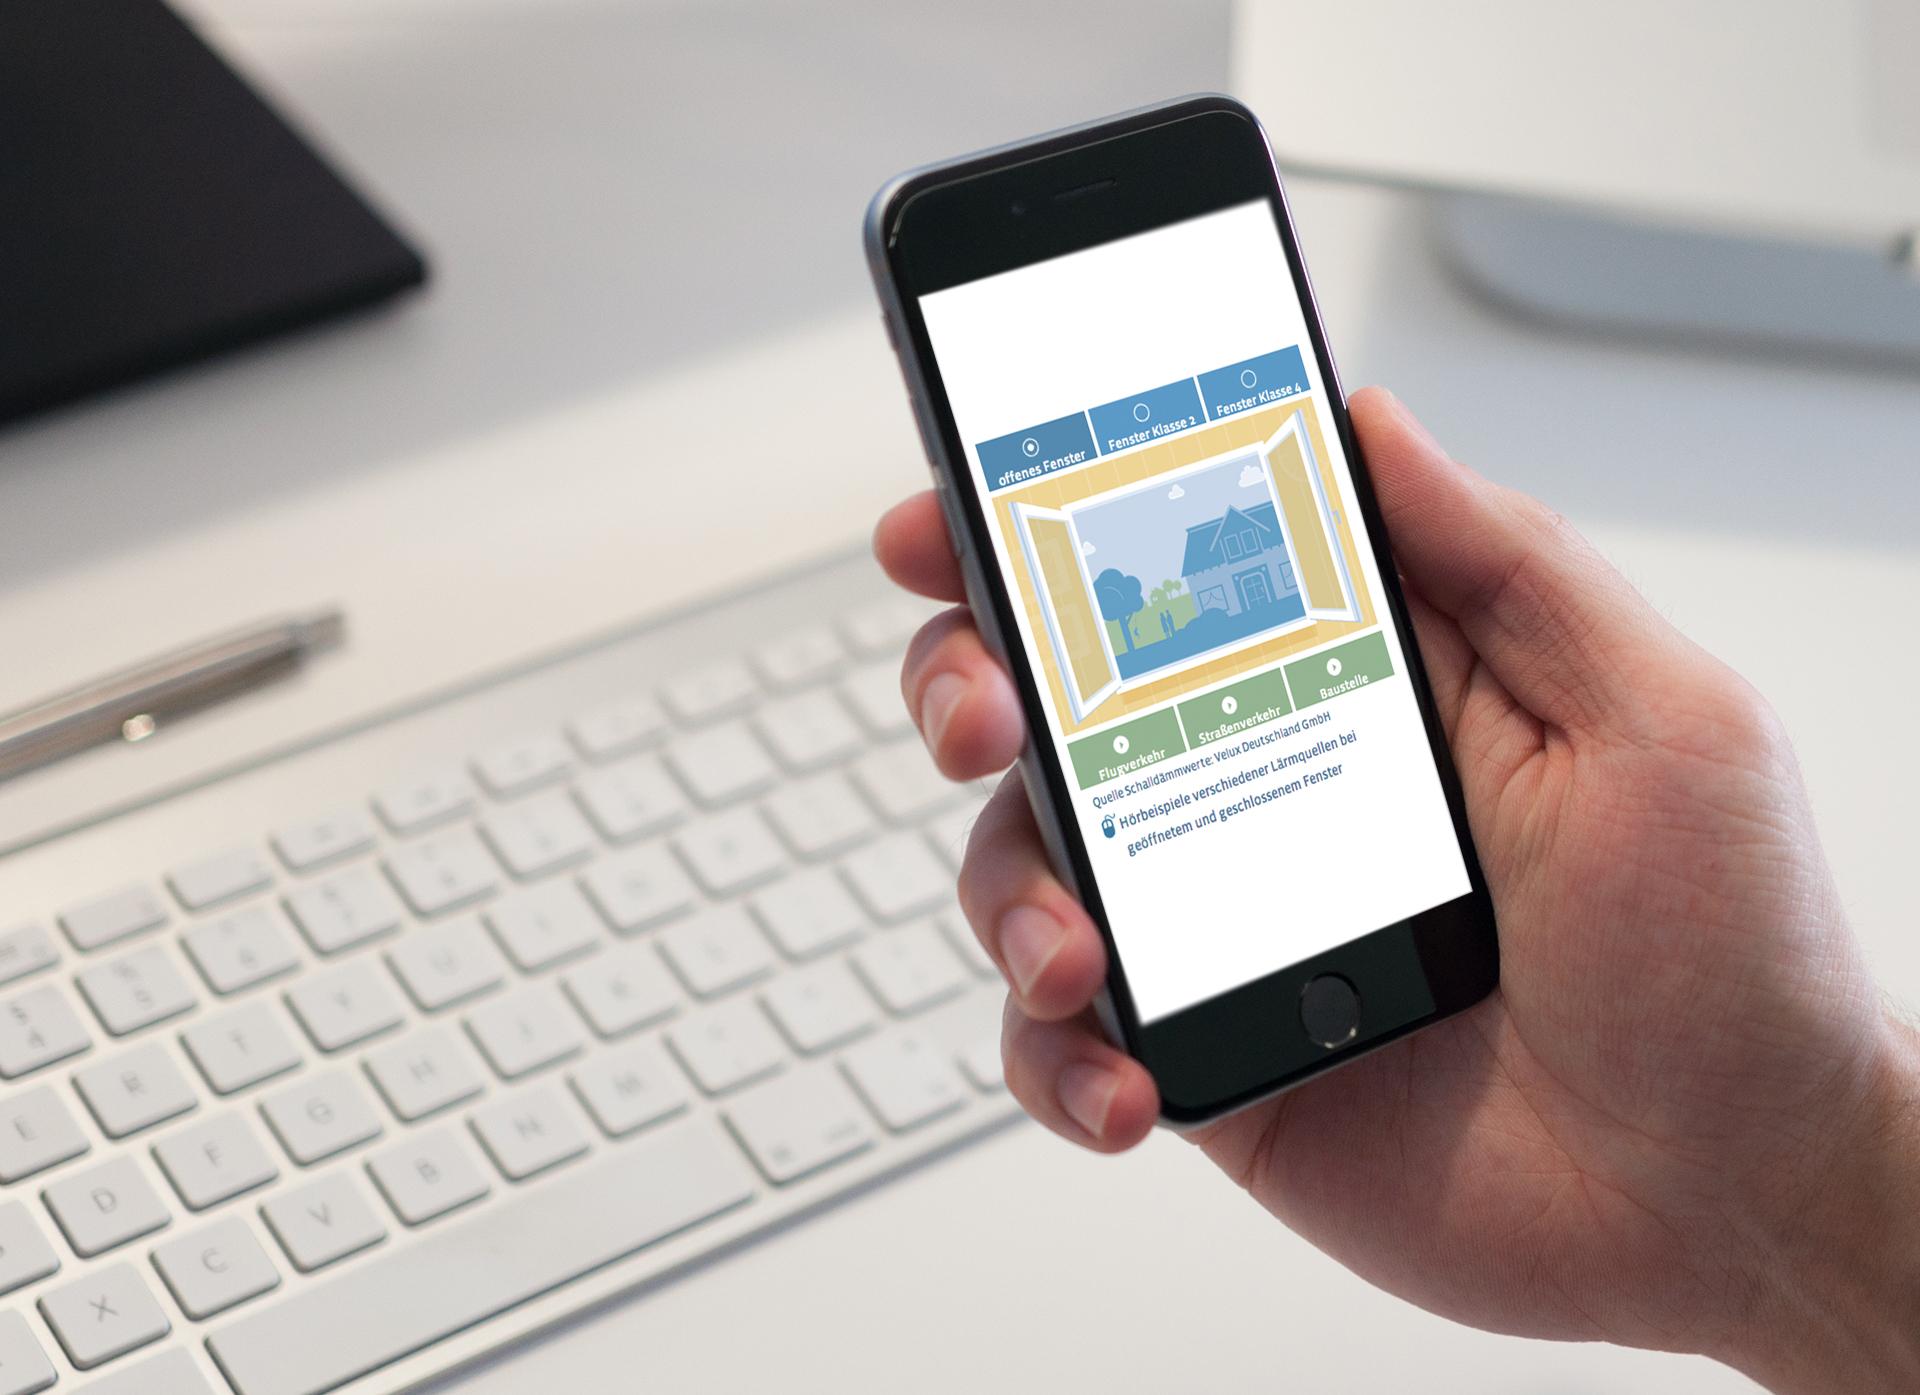 Touchscreen-Interaction